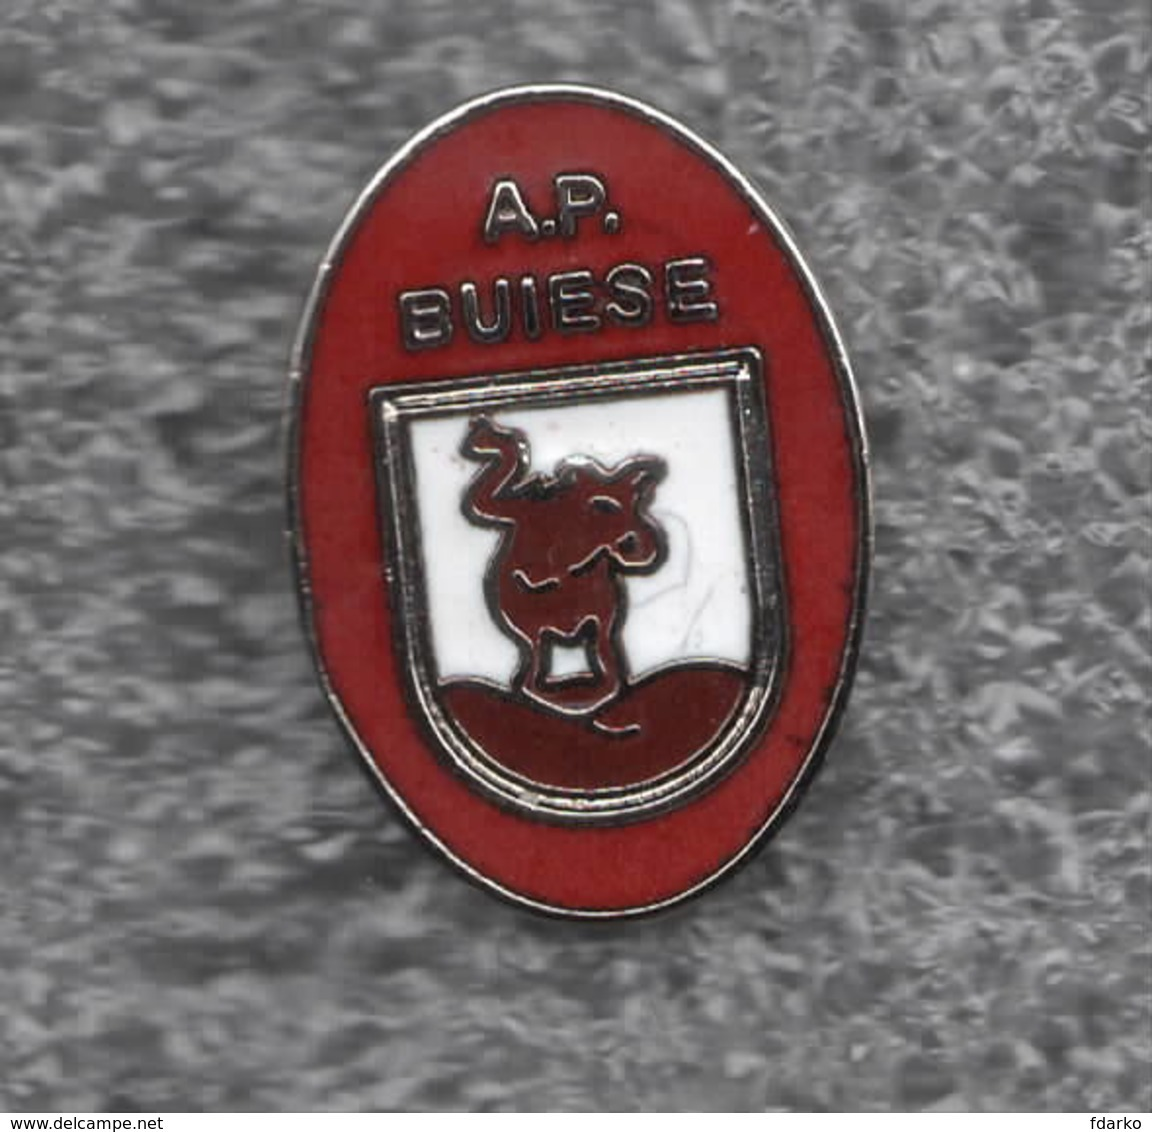 AP Buiese Udine Calcio Distintivi FootBall Soccer Pins Spilla Italy - Calcio